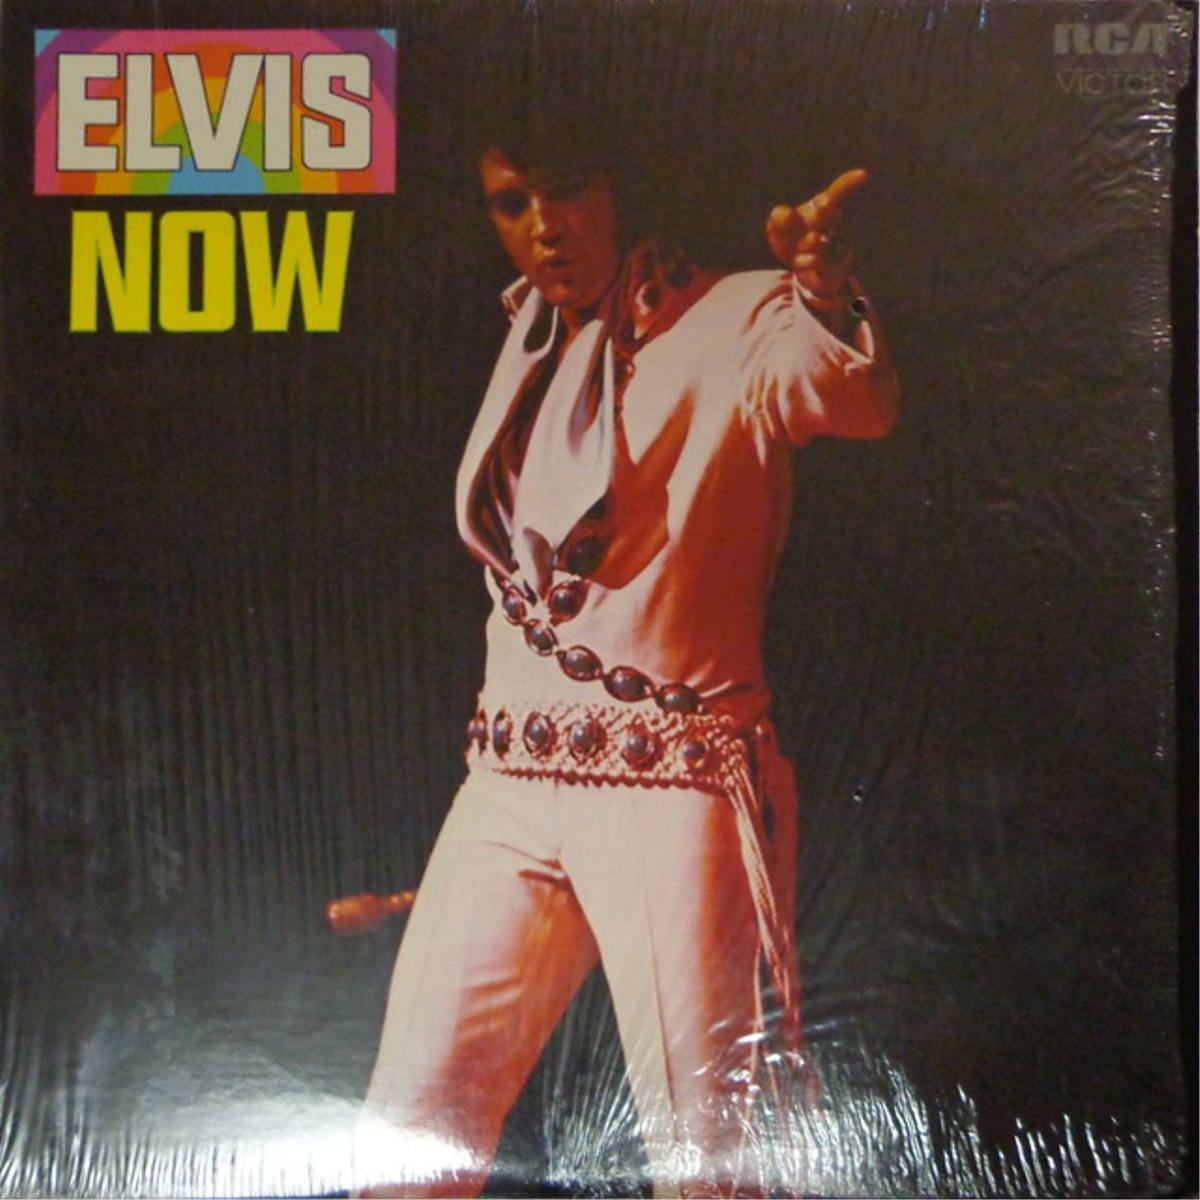 ELVIS NOW Lsp-4671ac7umx